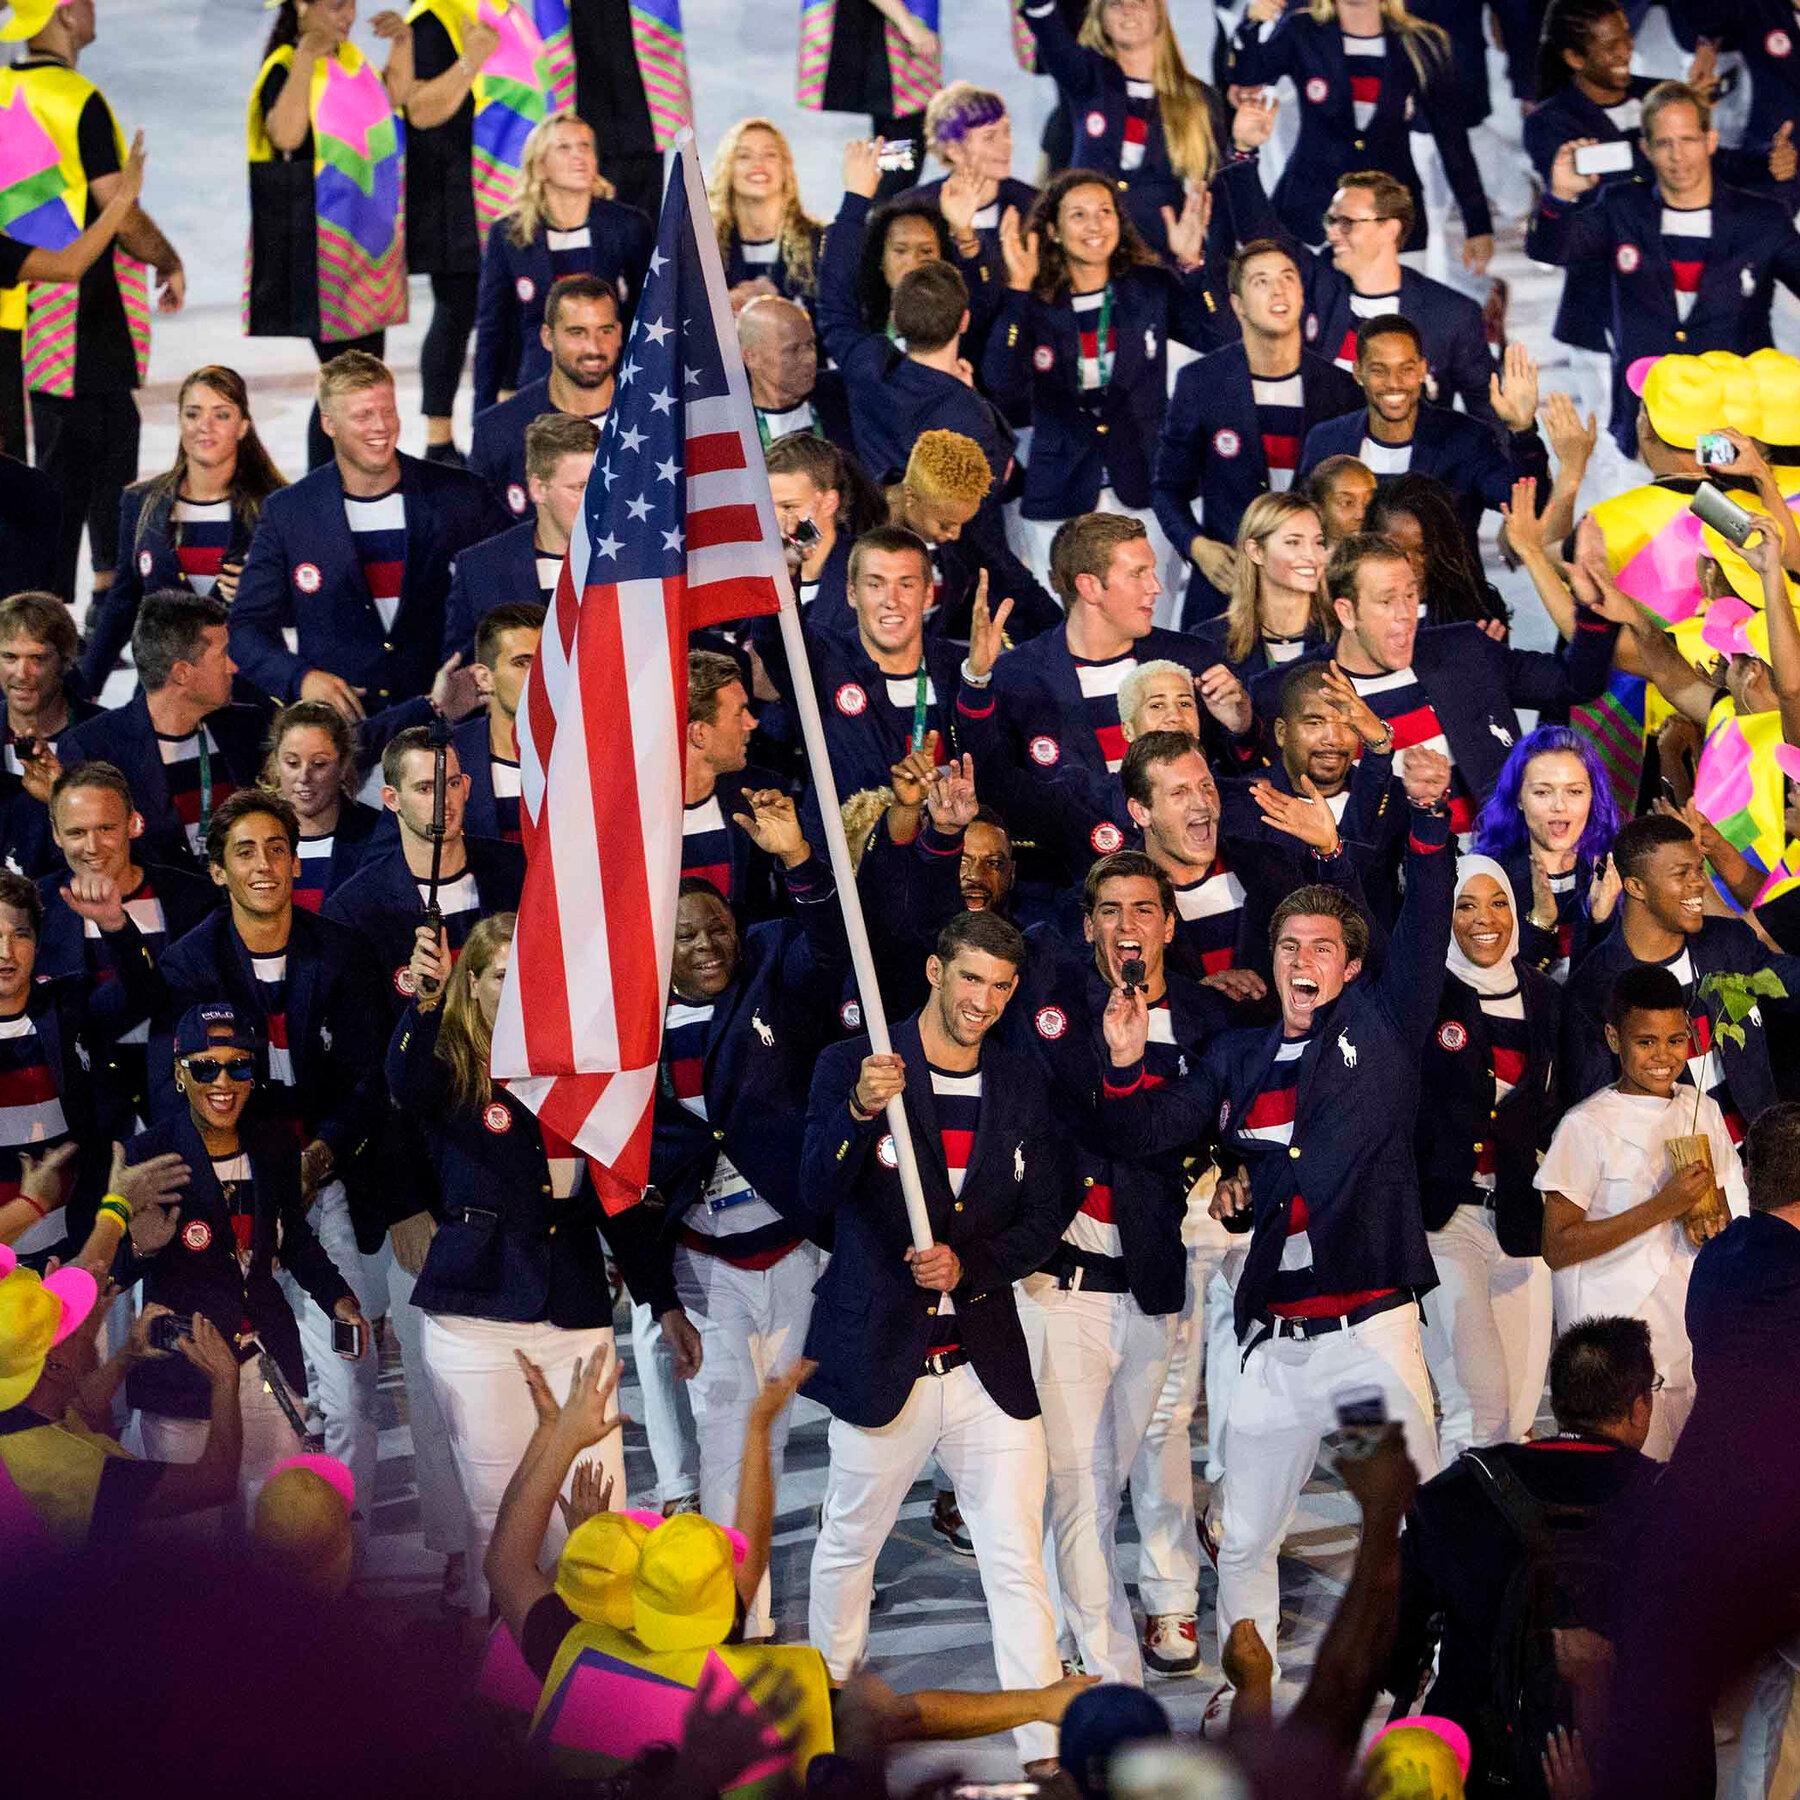 Olympics shawn rene zimmerman michael Phelps